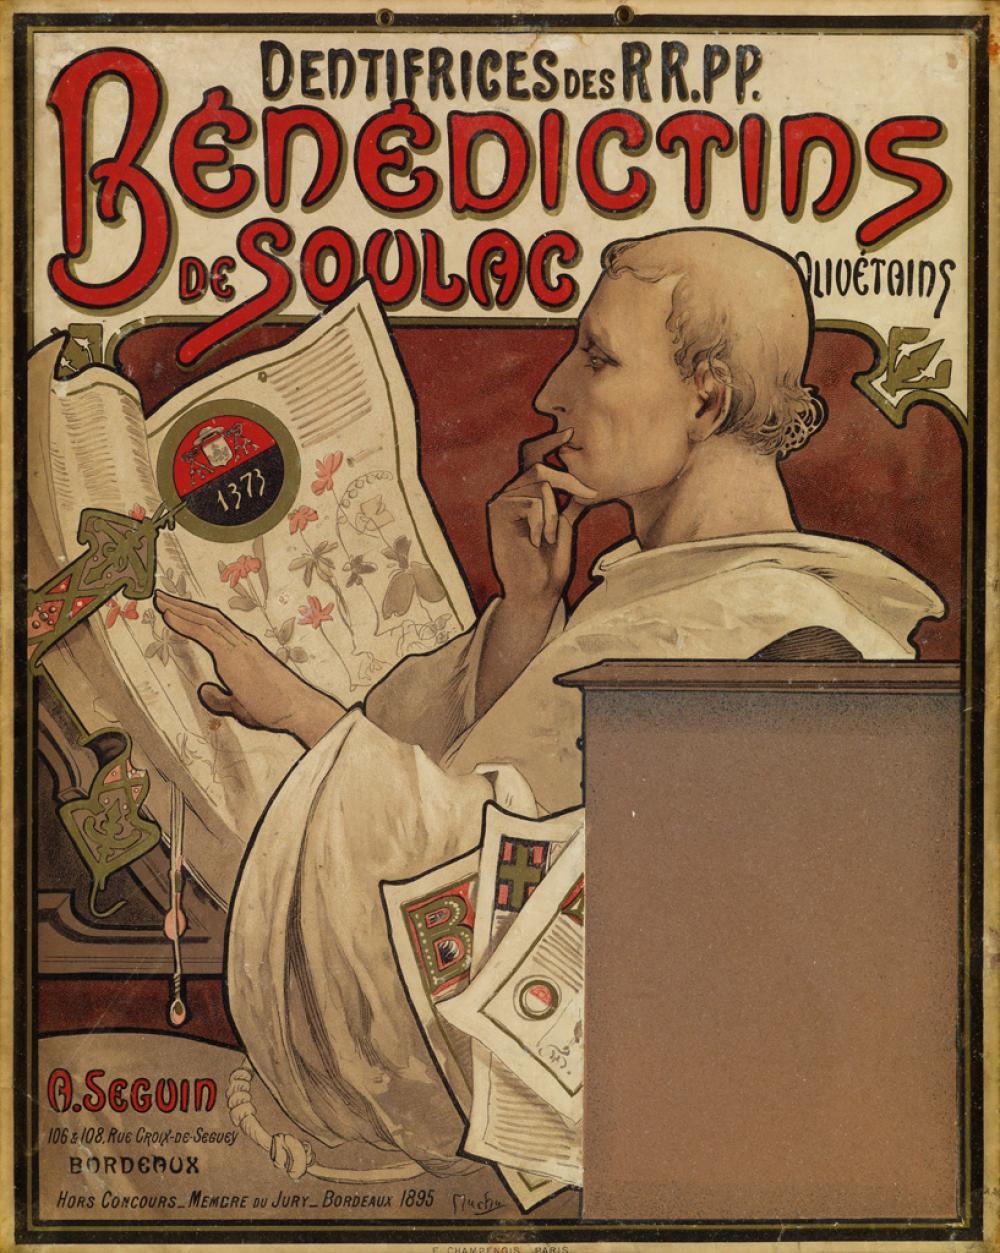 ALPHONSE MUCHA (1860-1939). BÉNÉDICTINS DE SOULAC. Circa 1896. 14x11 inches, 36x29 cm. F. Champenois, Paris.